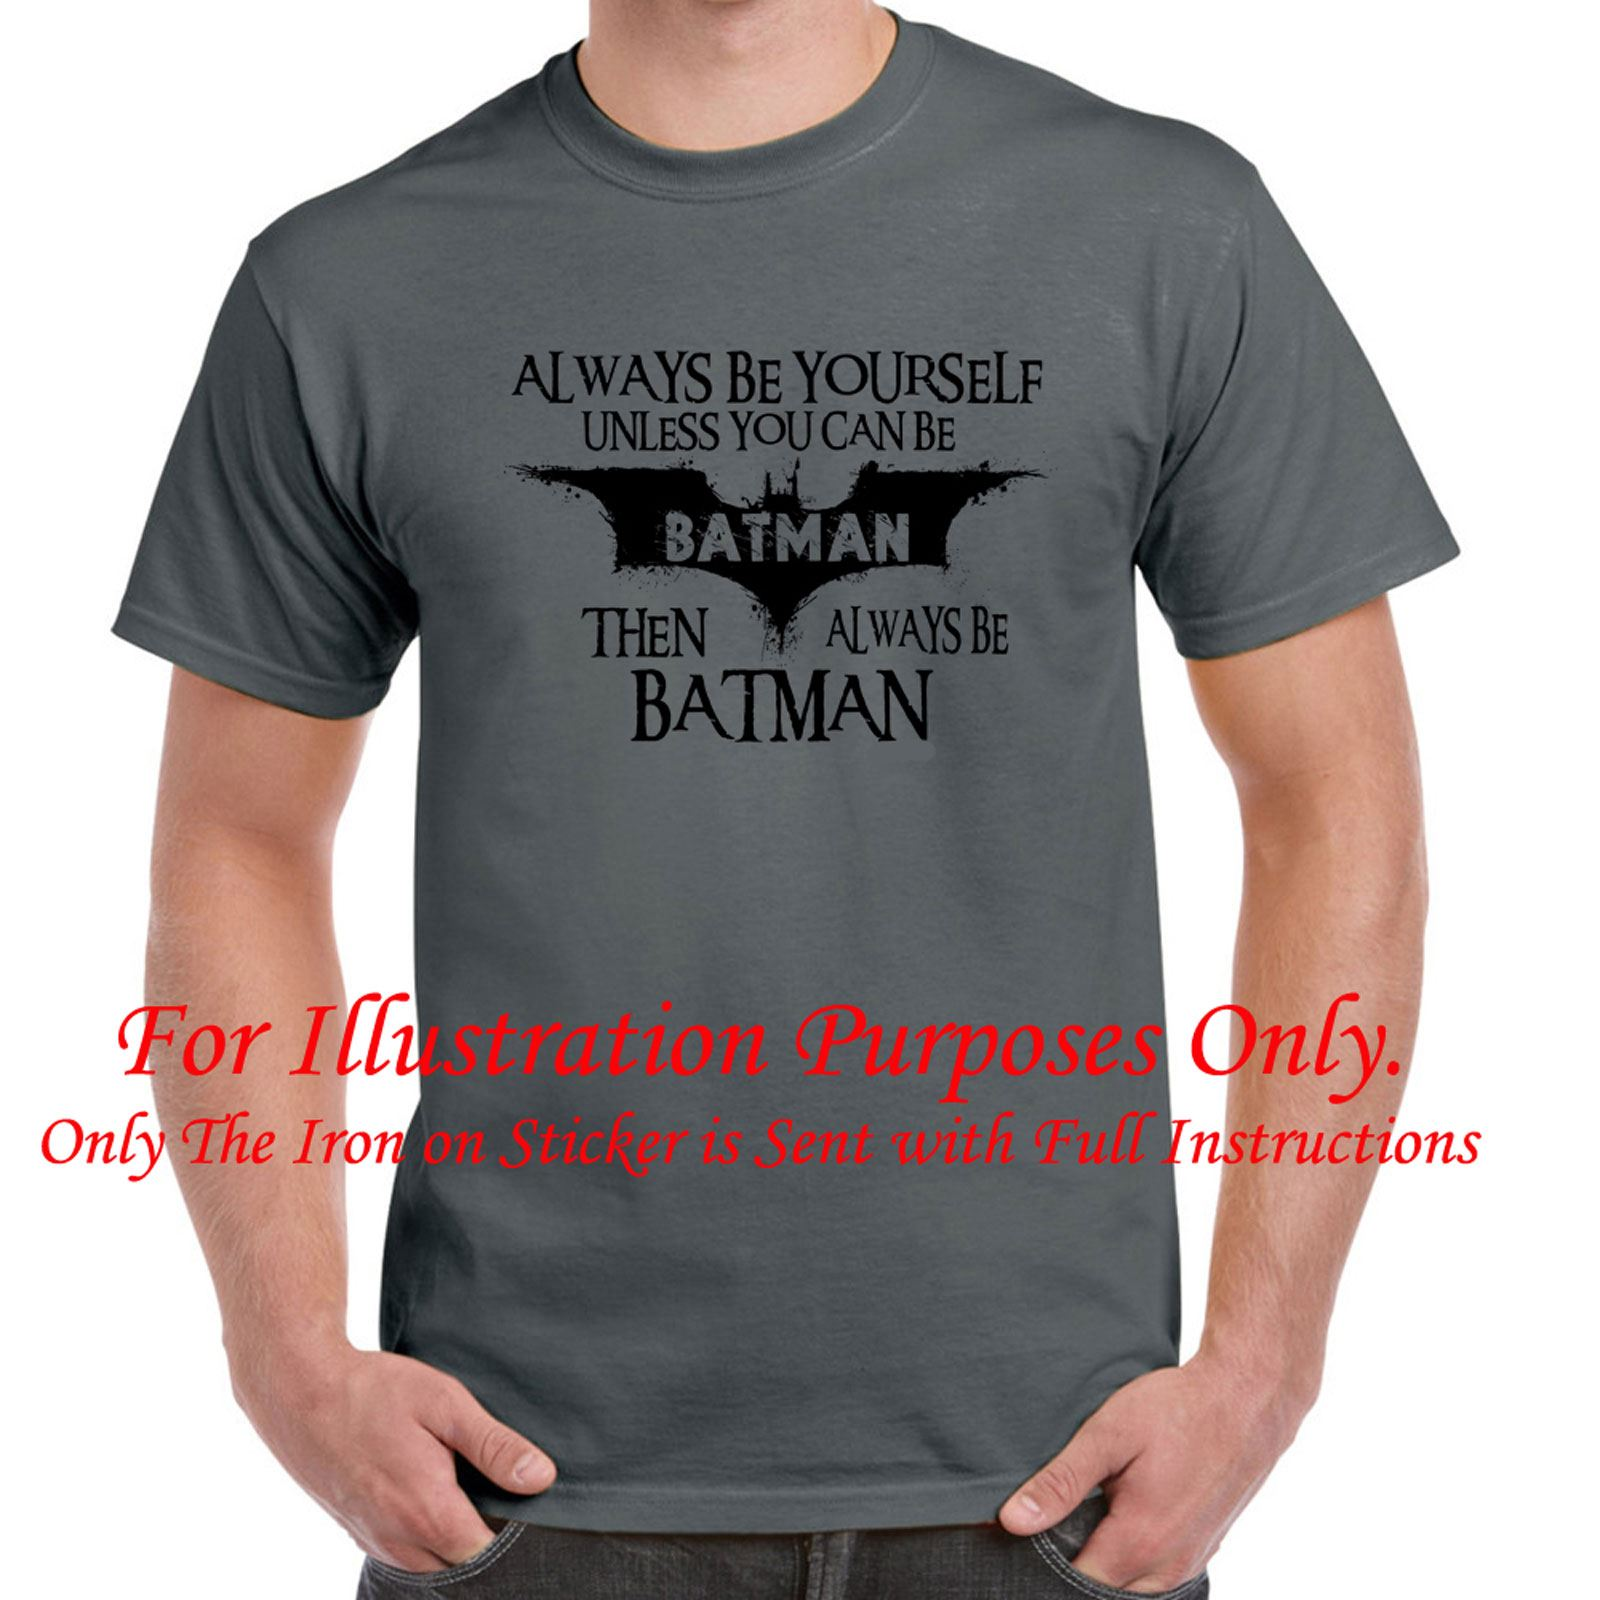 mens funny sayings slogans t shirtsalways be batman tshirt